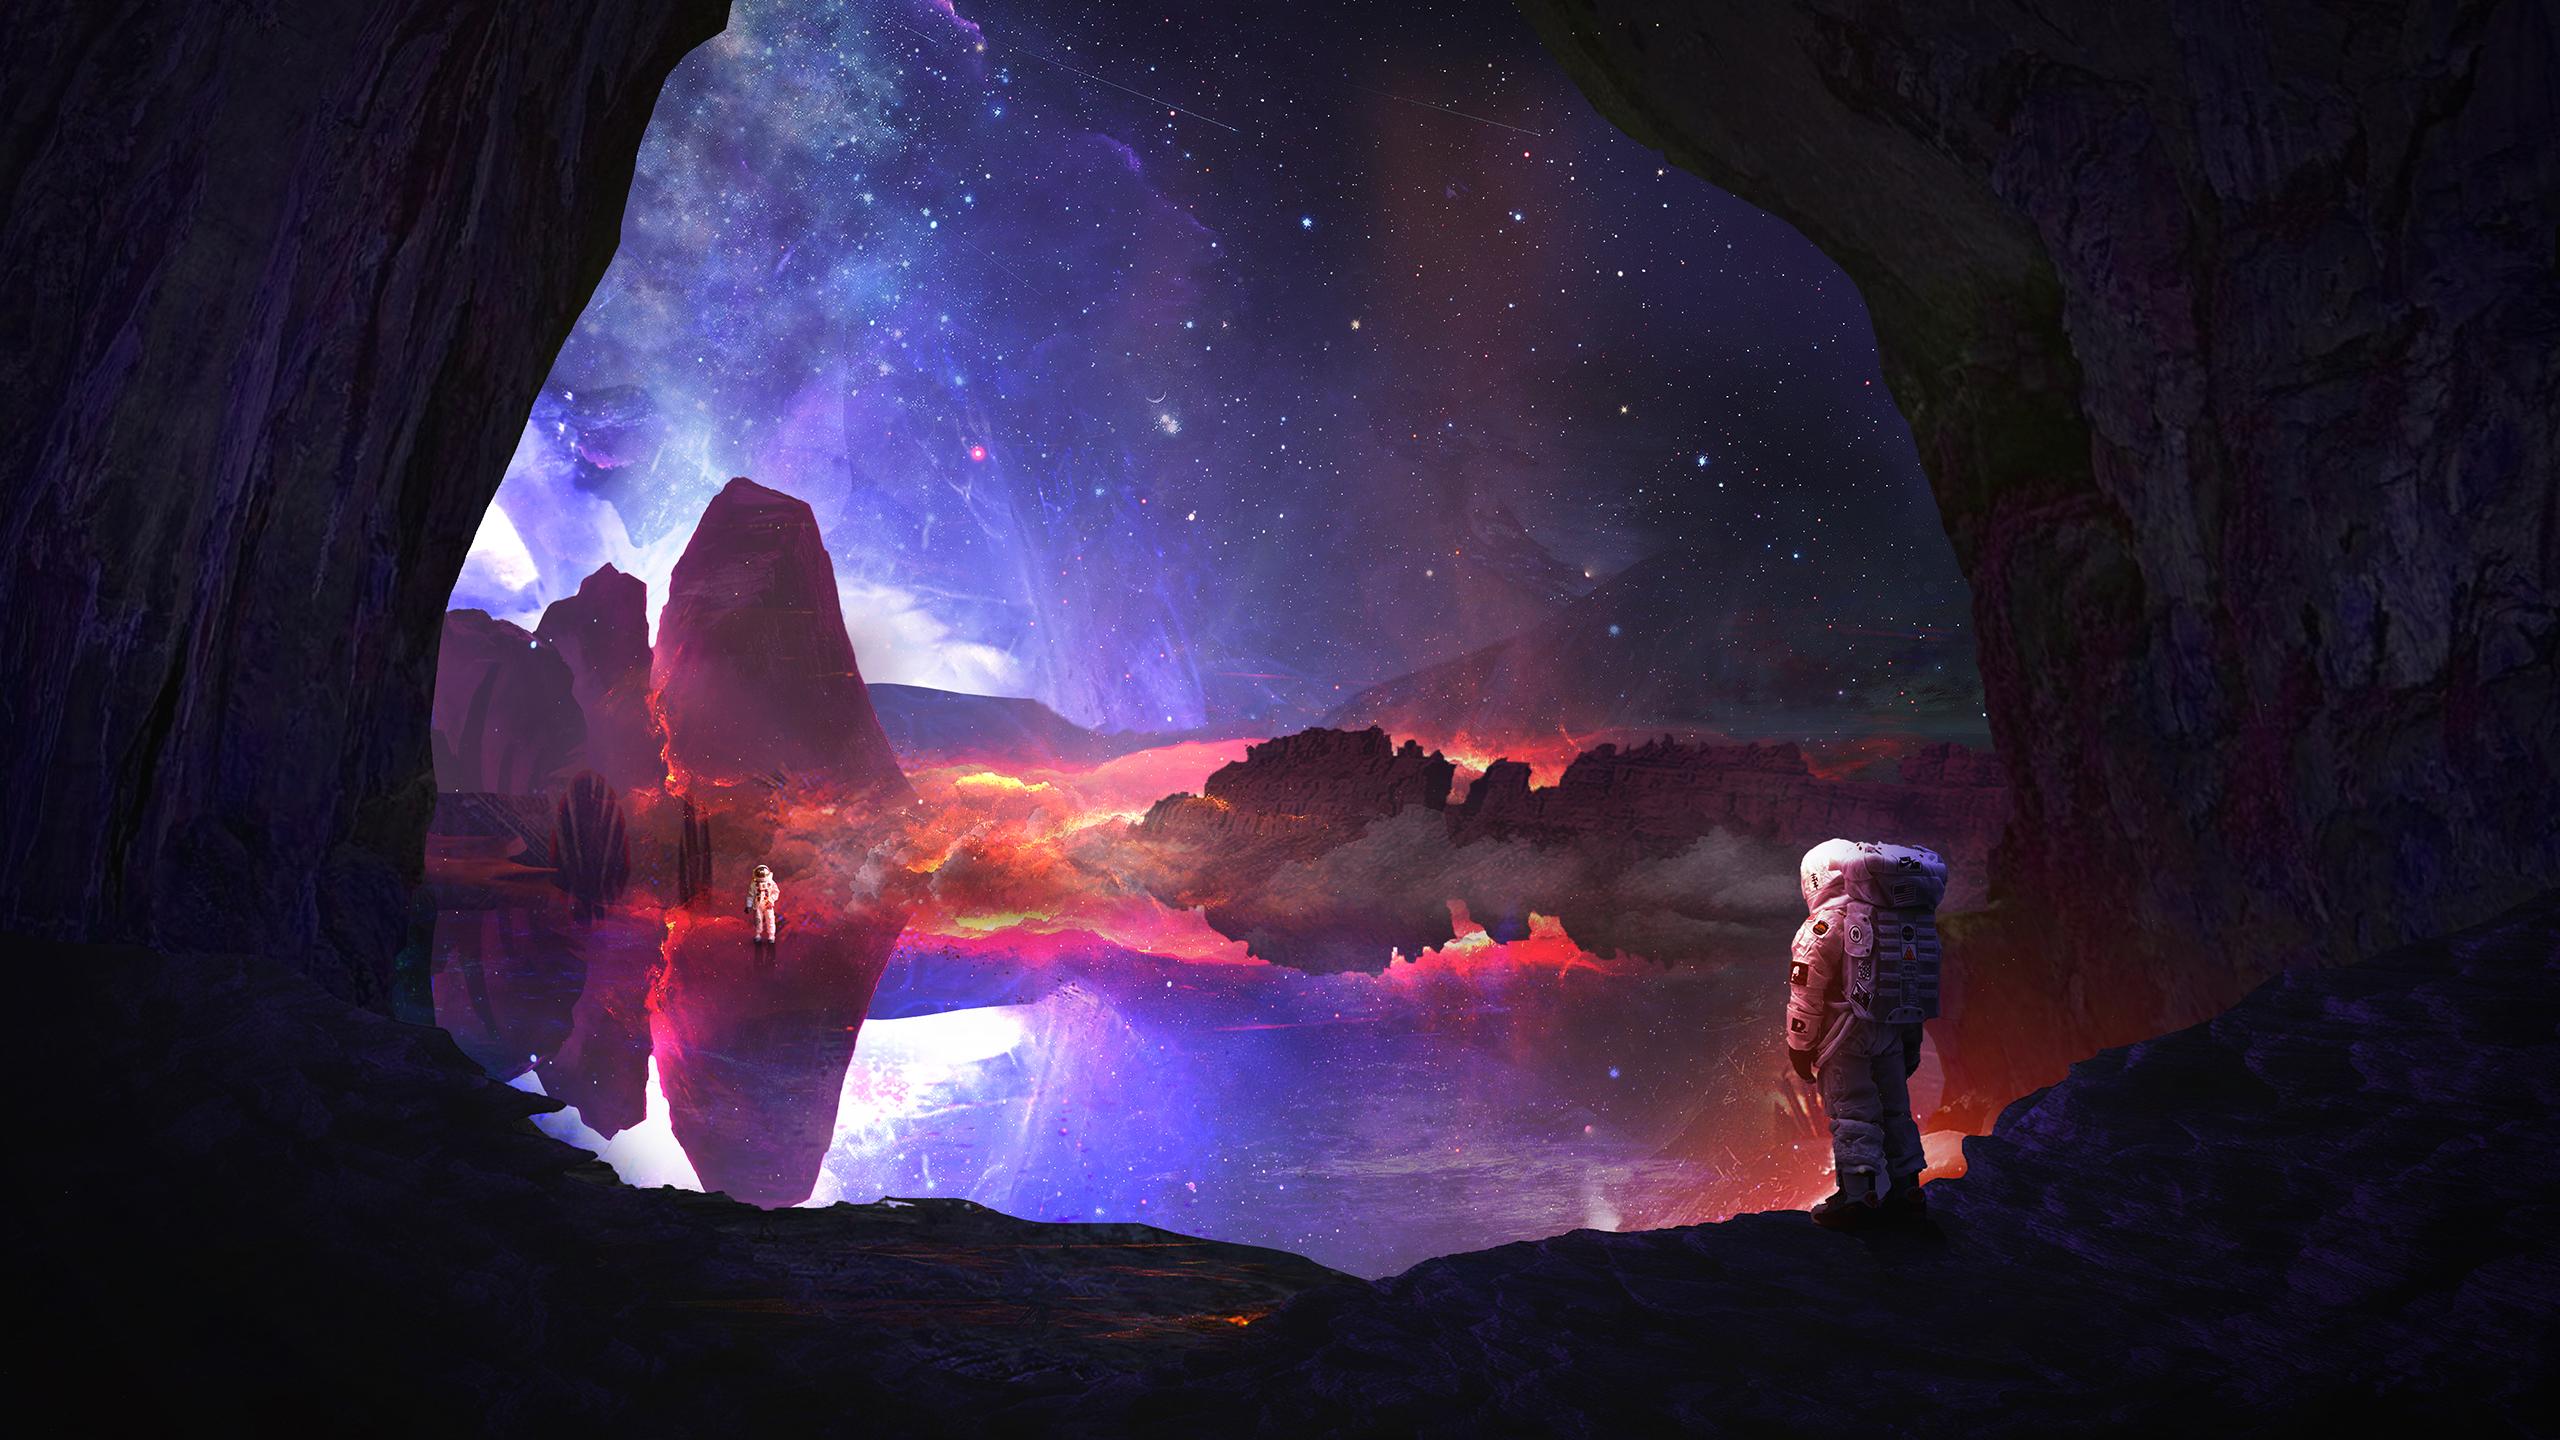 General 2560x1440 digital art space stars rock mountains galaxy Martina Stipan astronaut